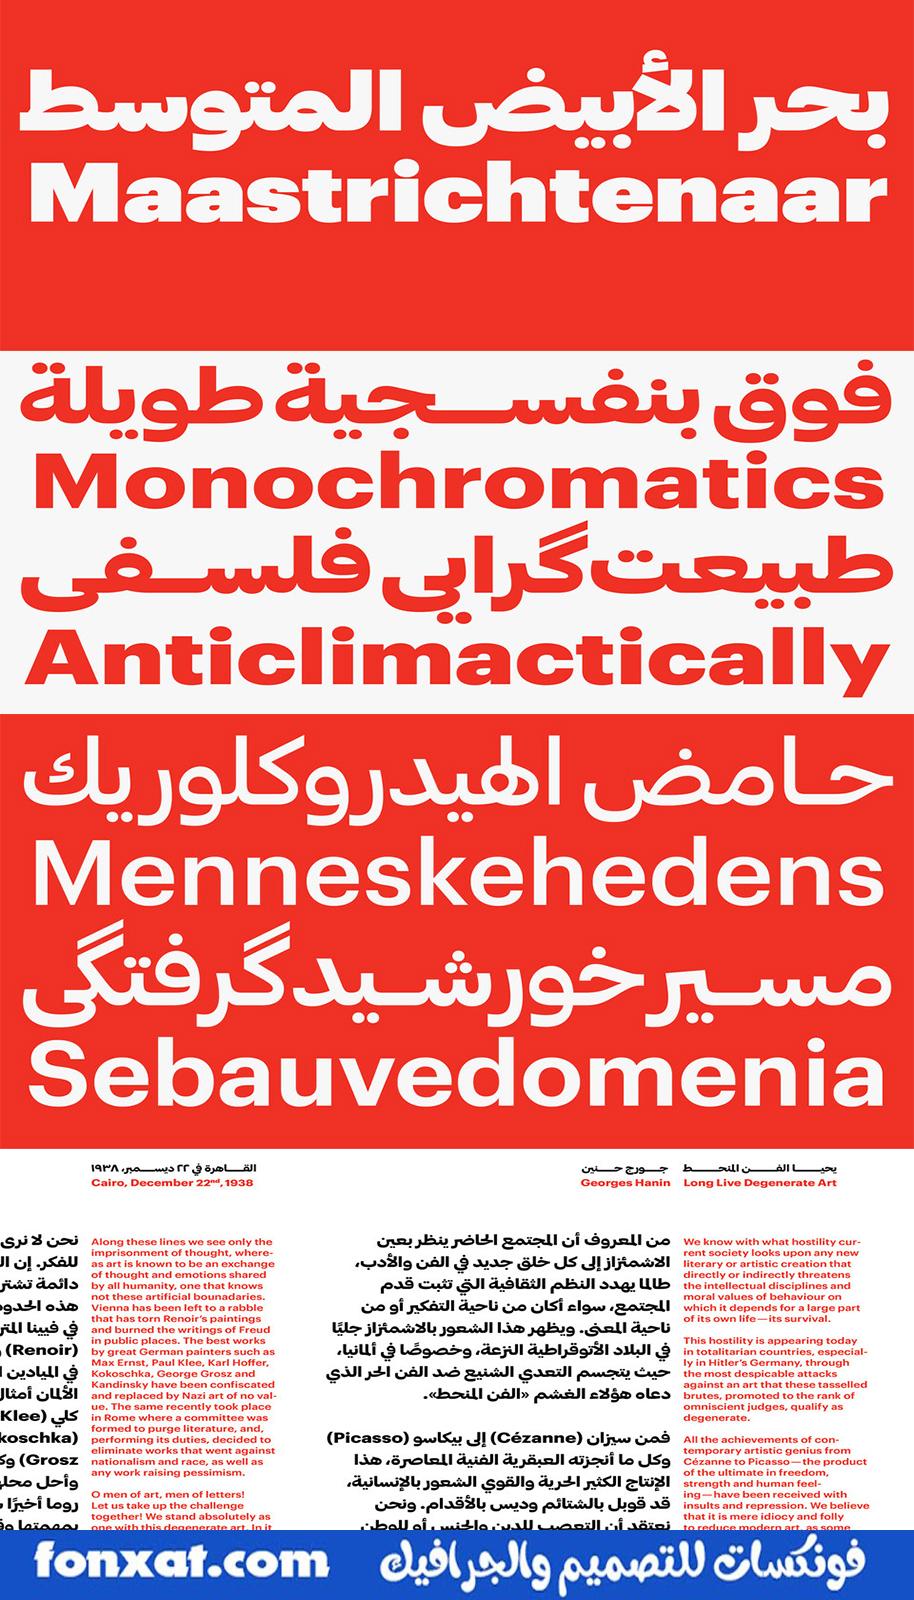 Download Arabic font design. Arabic graphic font